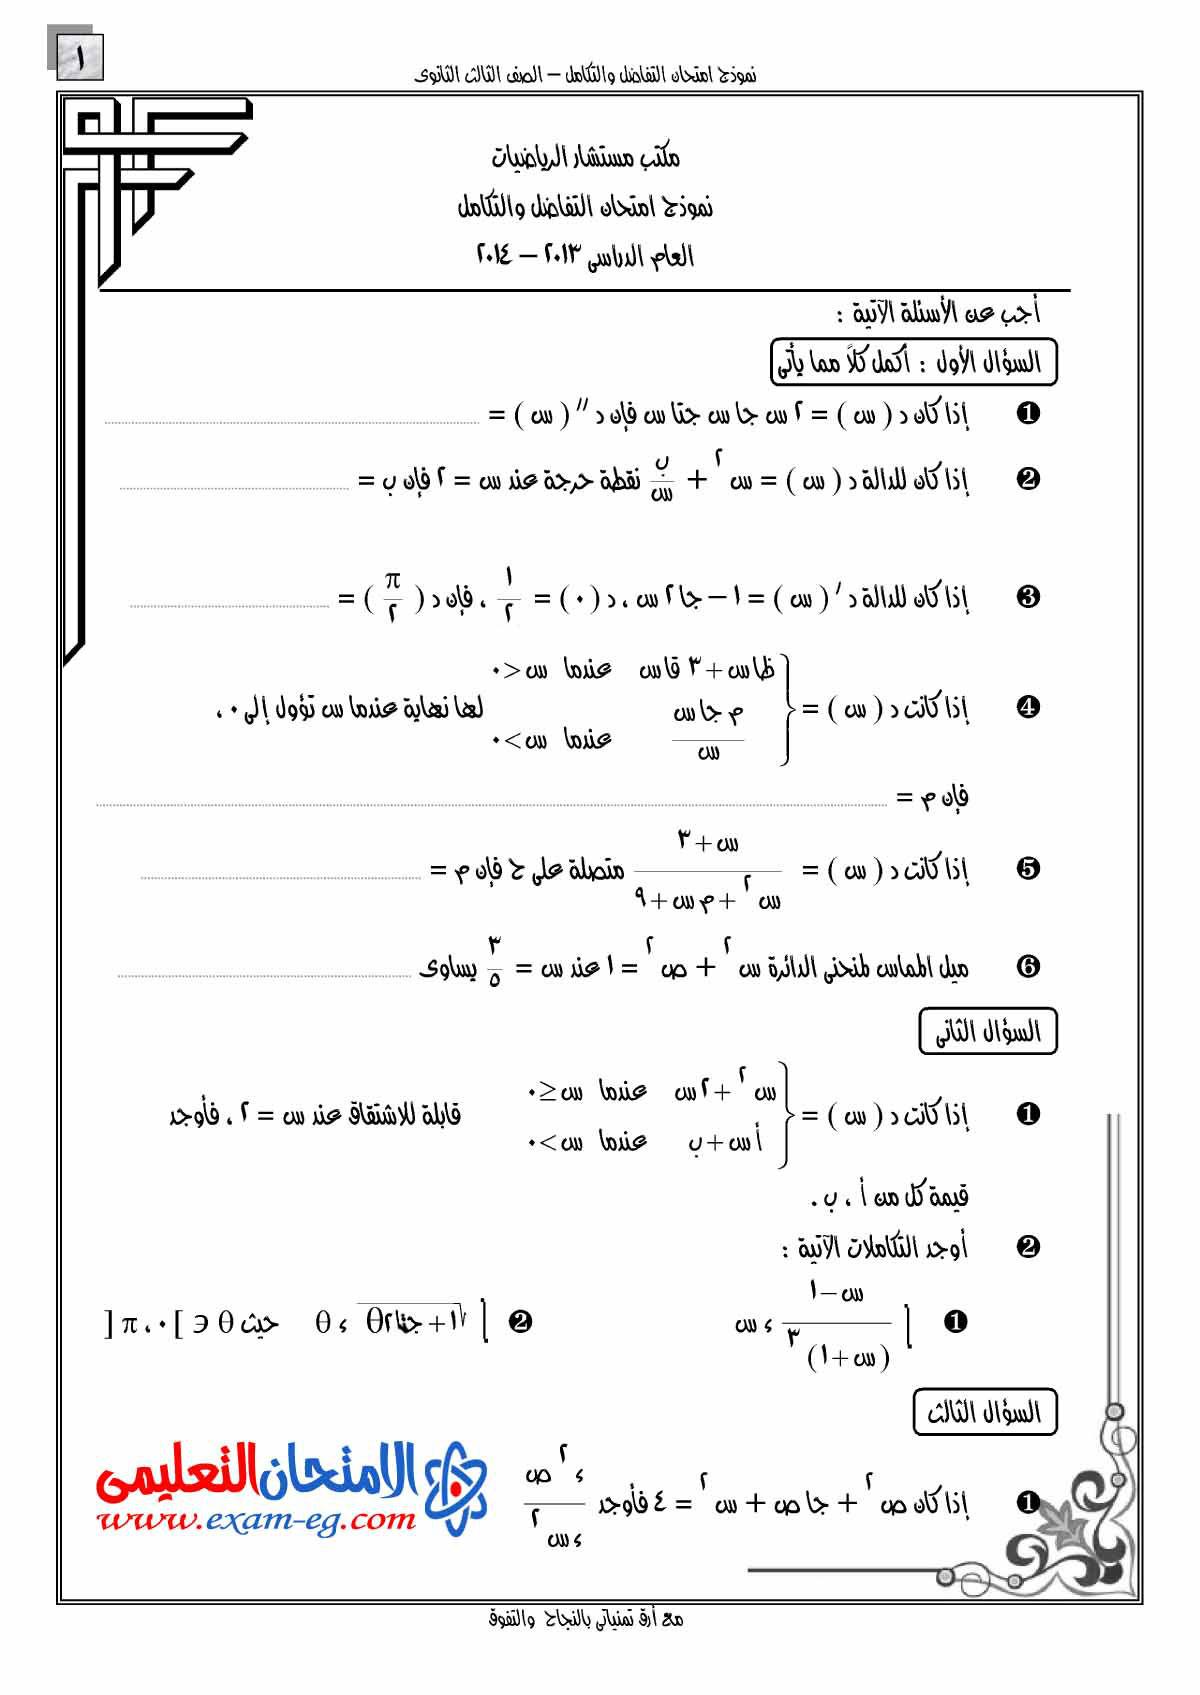 exam-eg.com_1403332690231.jpg